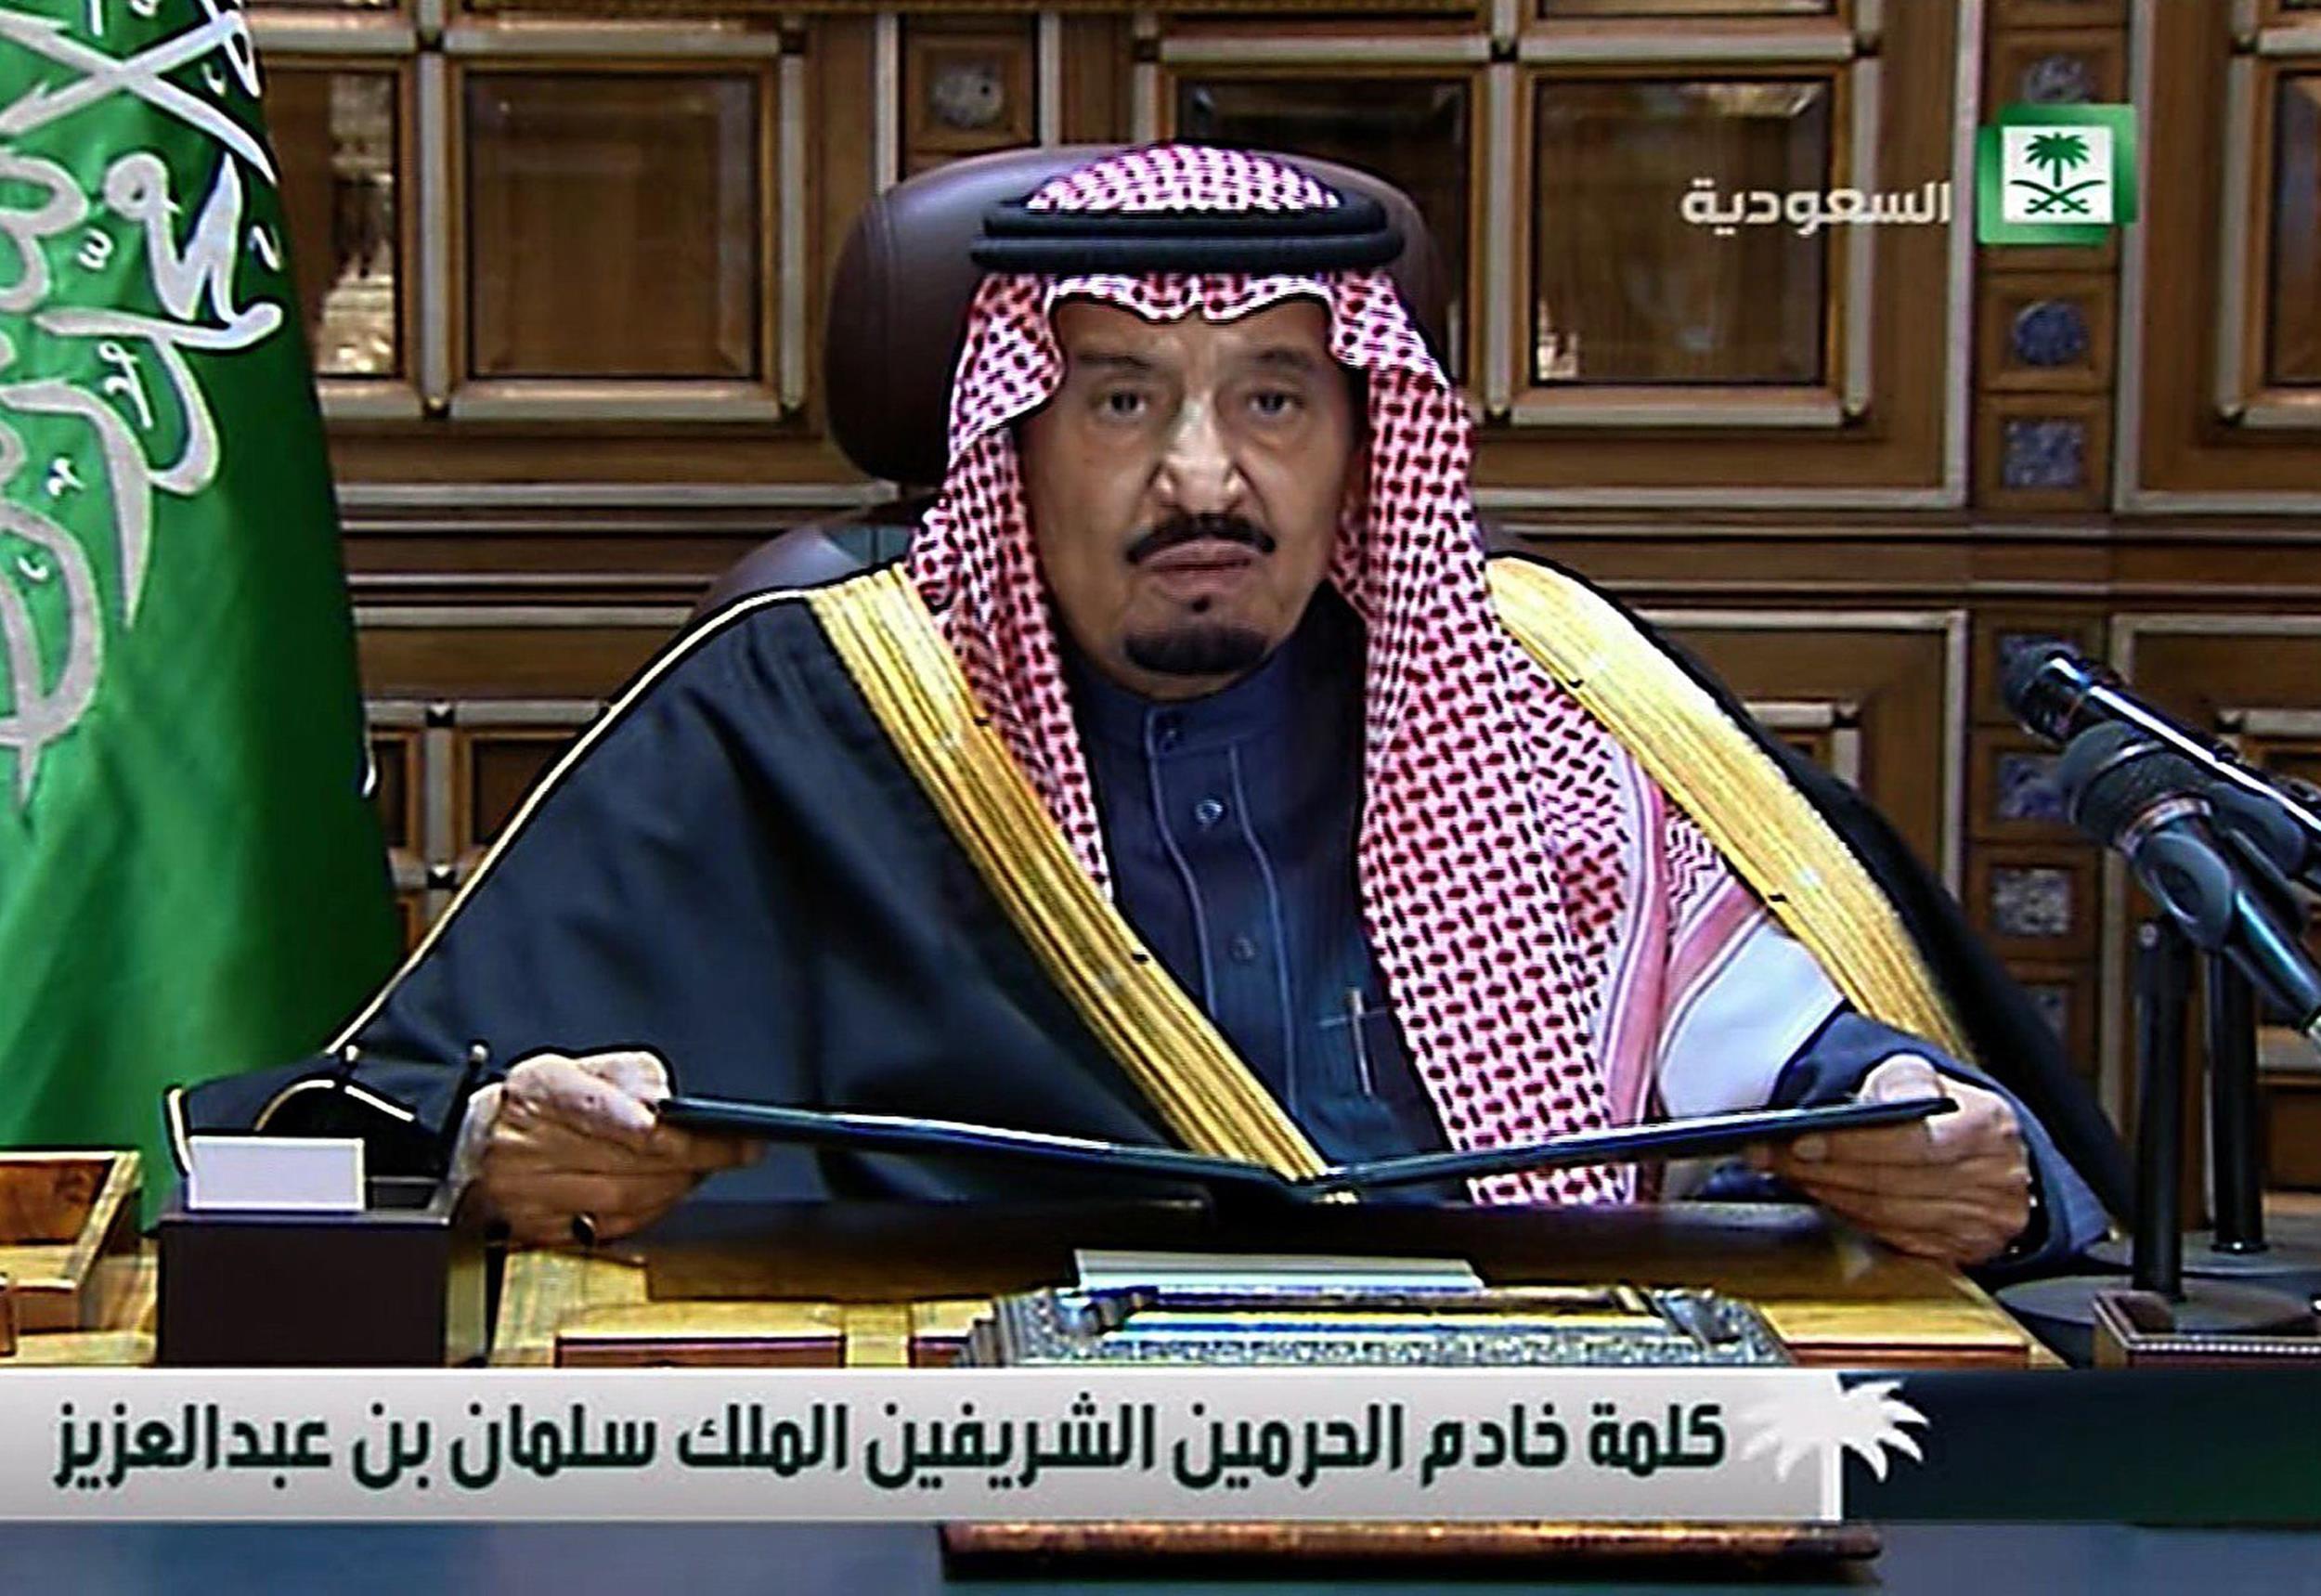 Image result for photos of saudi king salman